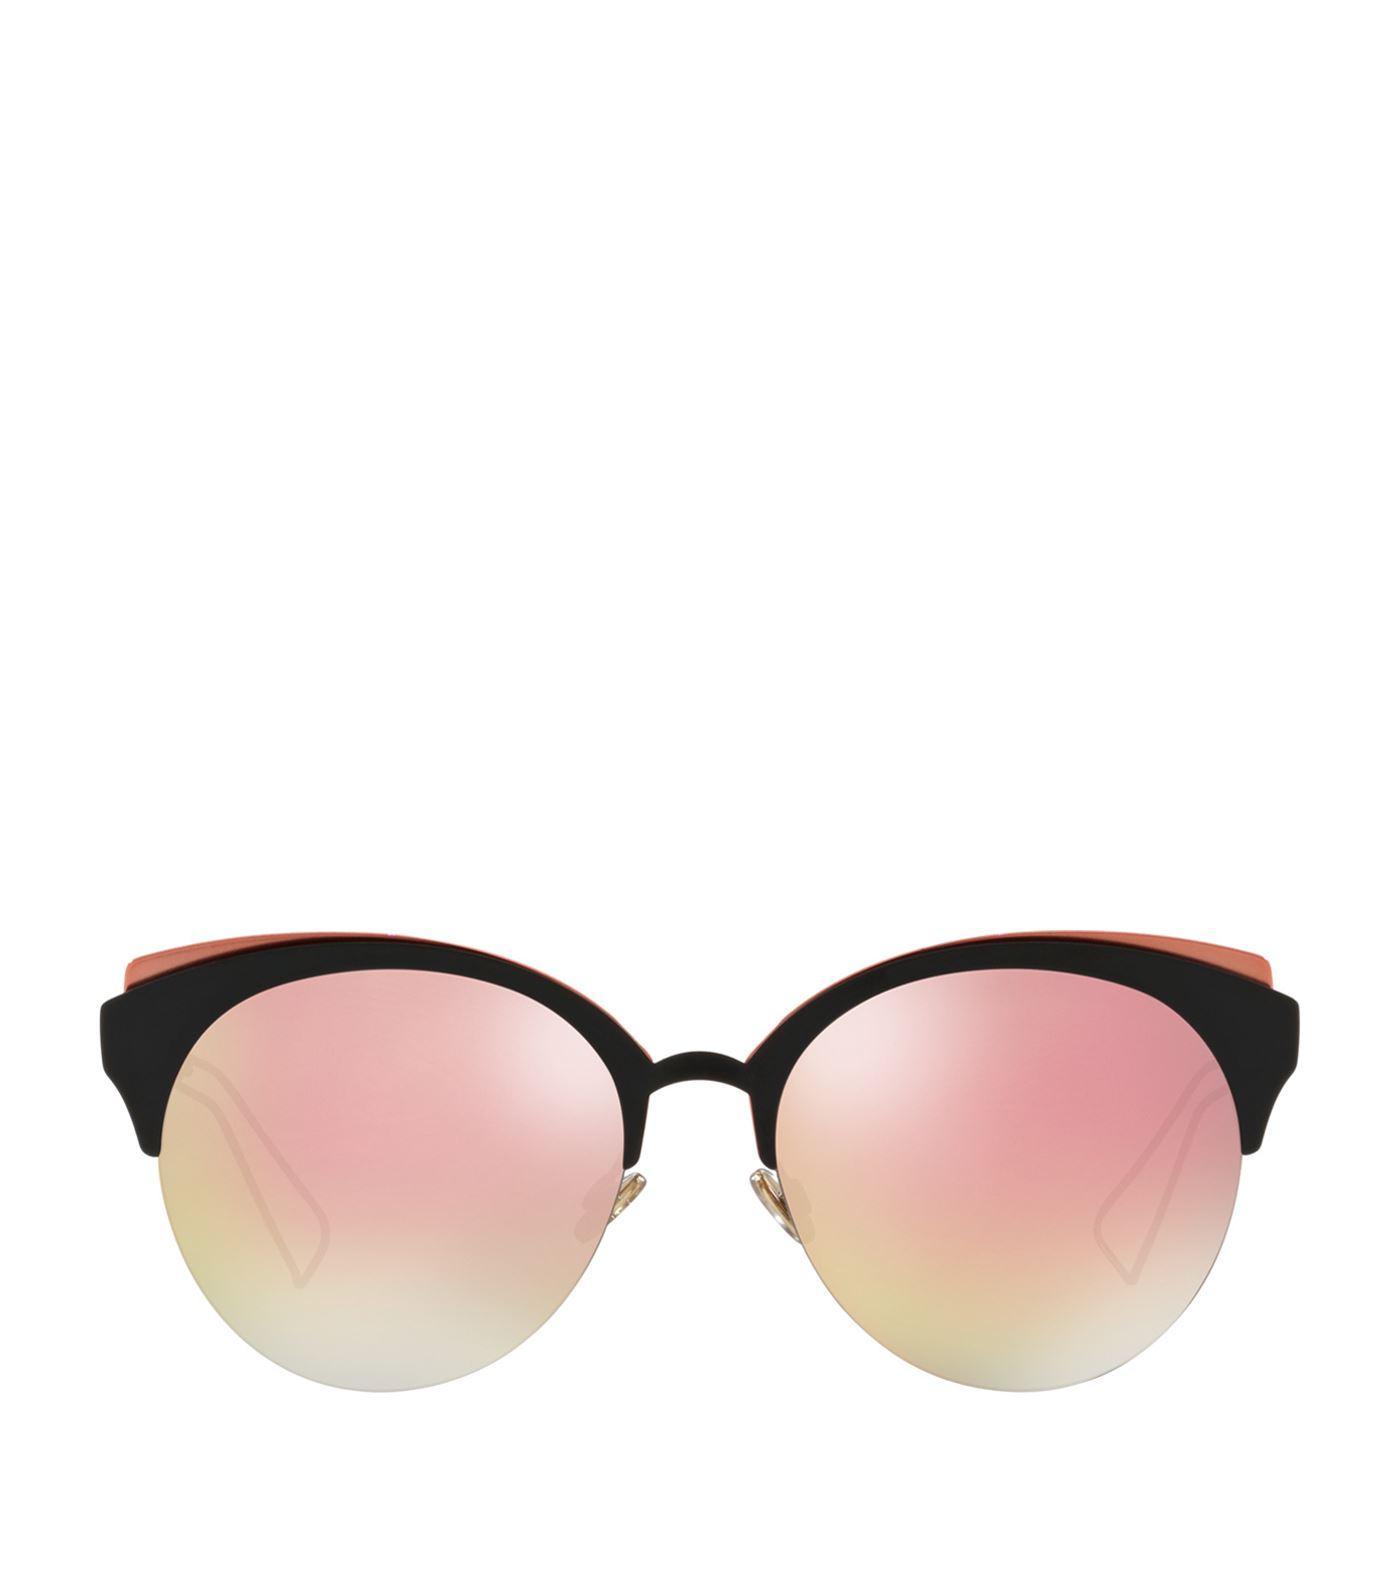 Dior Ama Club Metal Sunglasses In Black